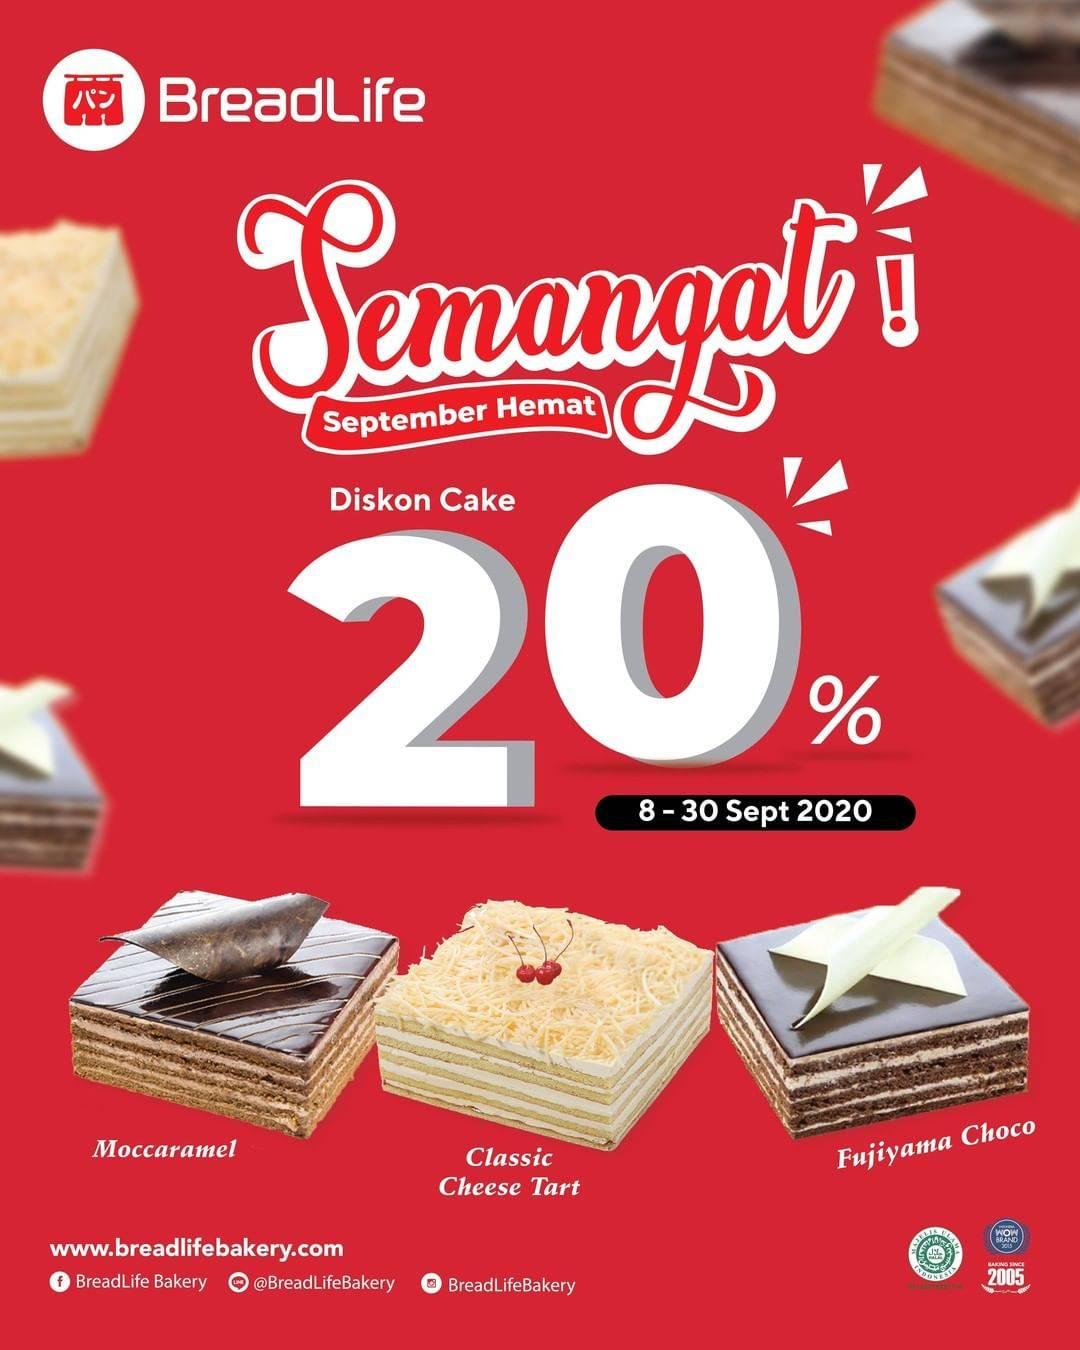 Diskon Breadlife Promo Semangat September Hemat Diskon Cake 20%